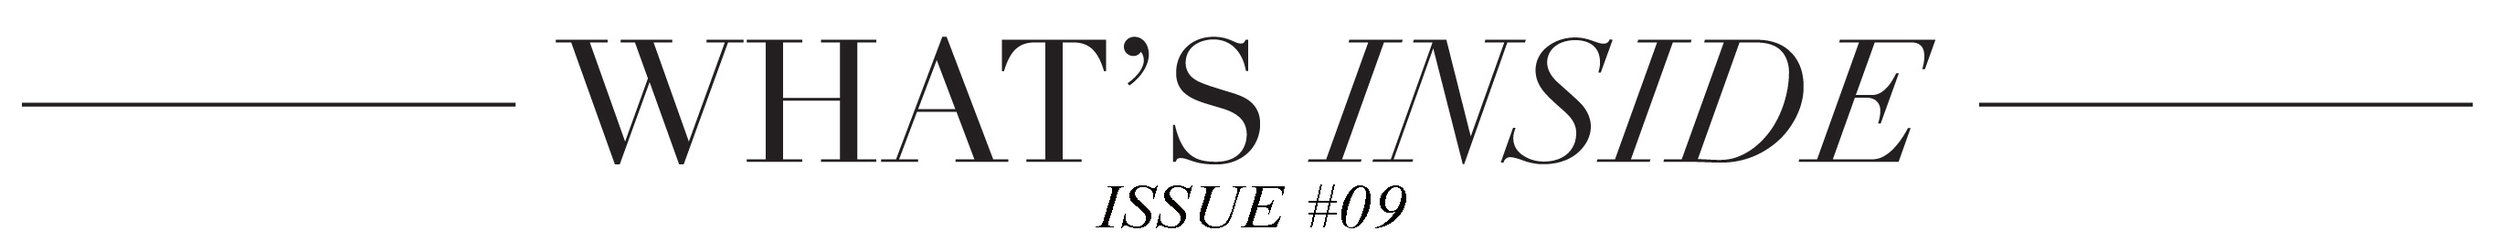 ISSUE 9.jpg